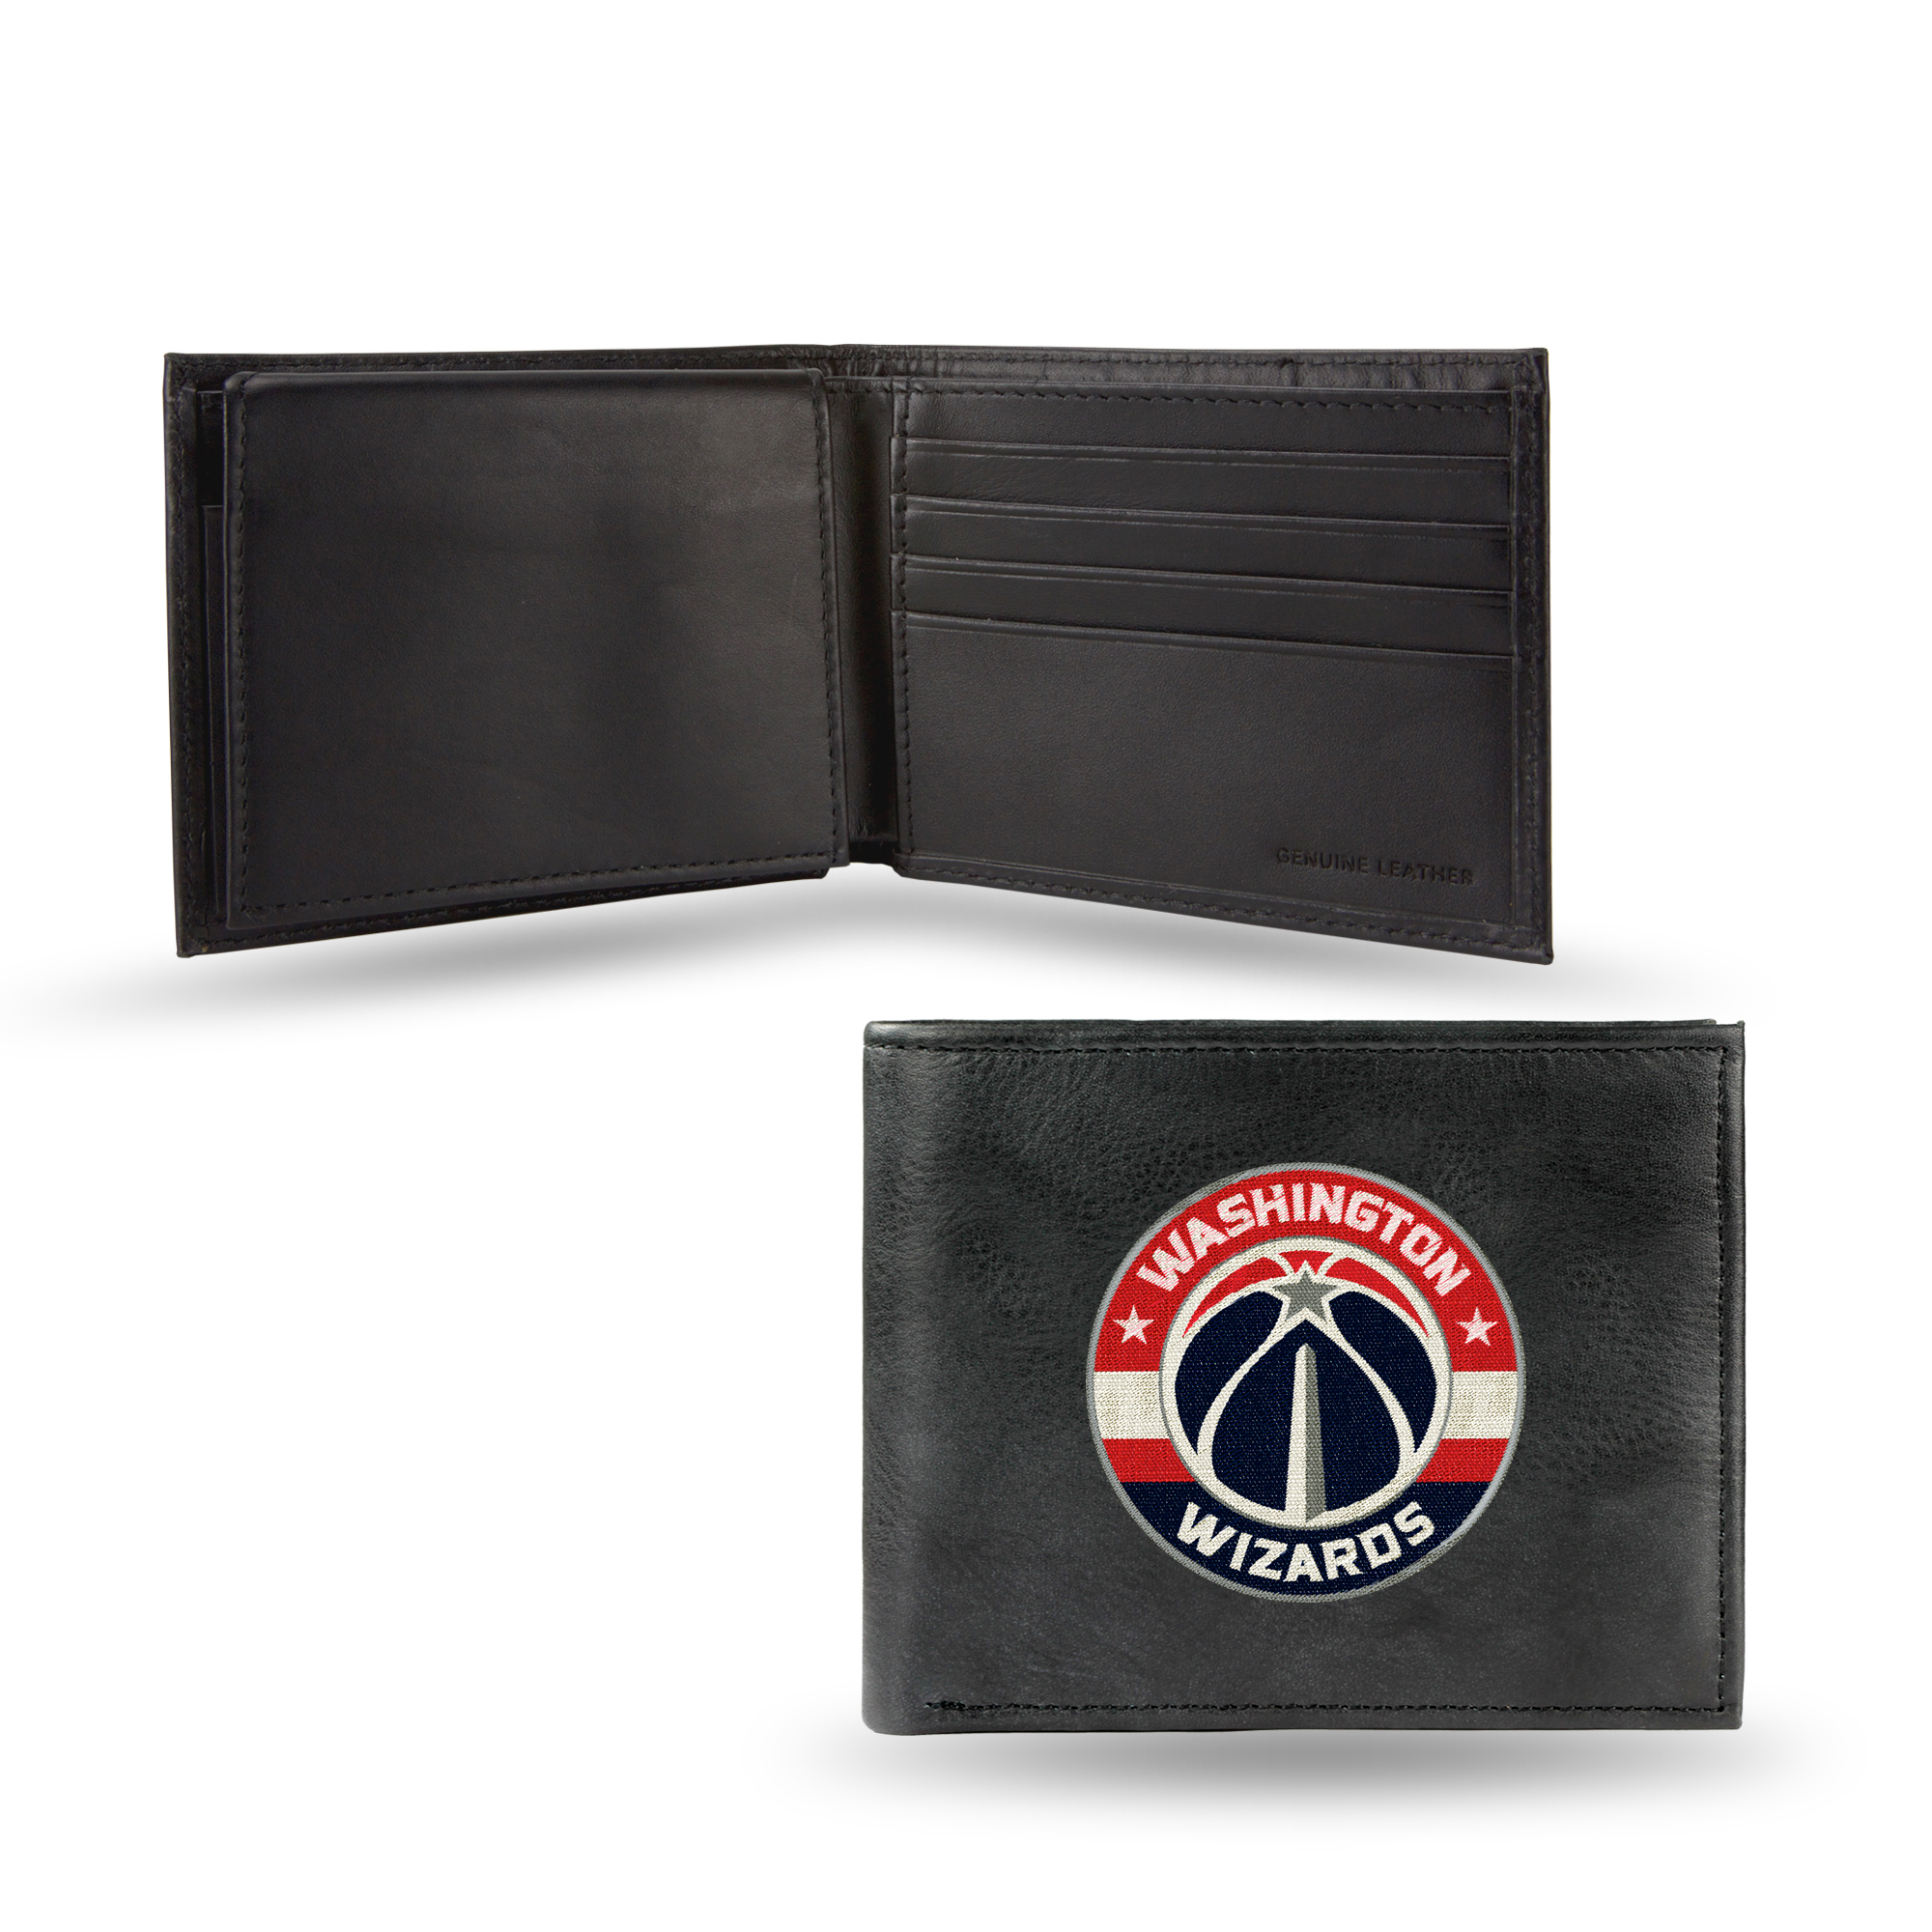 NBA - Men's Washington Wizards Embroidered Billfold Wallet